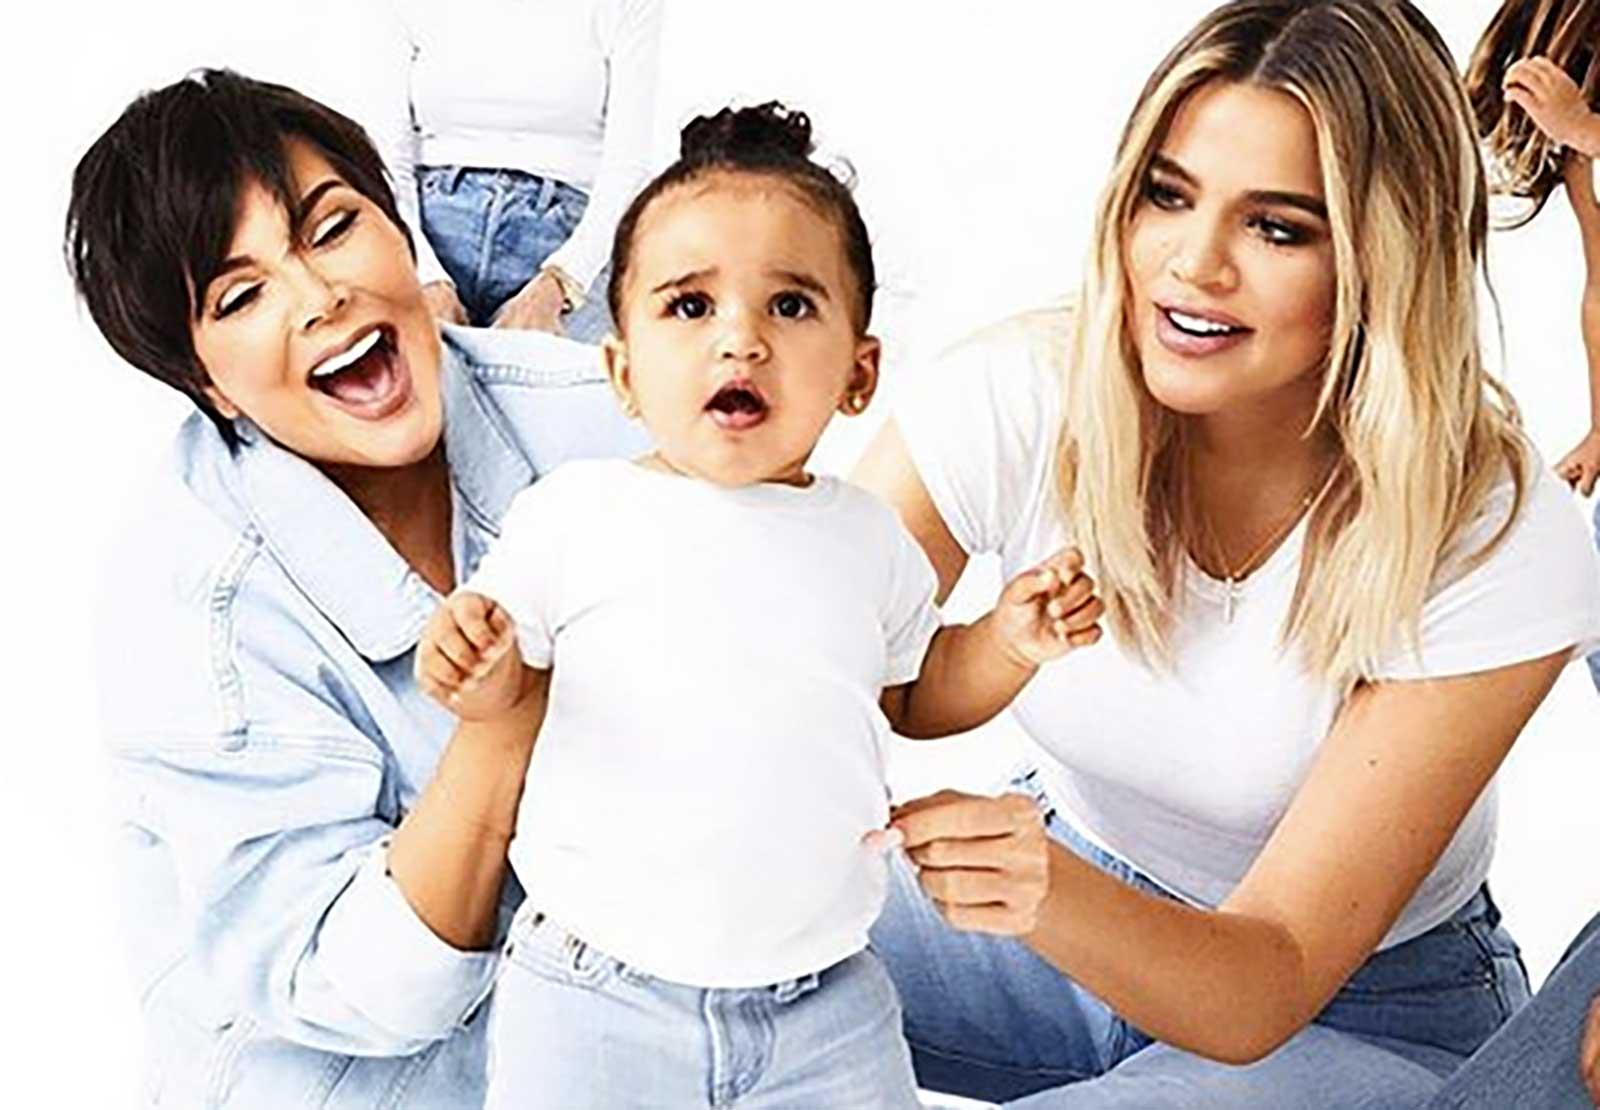 Kris Jenner, Khloé Kardashian, Dream Kardashian